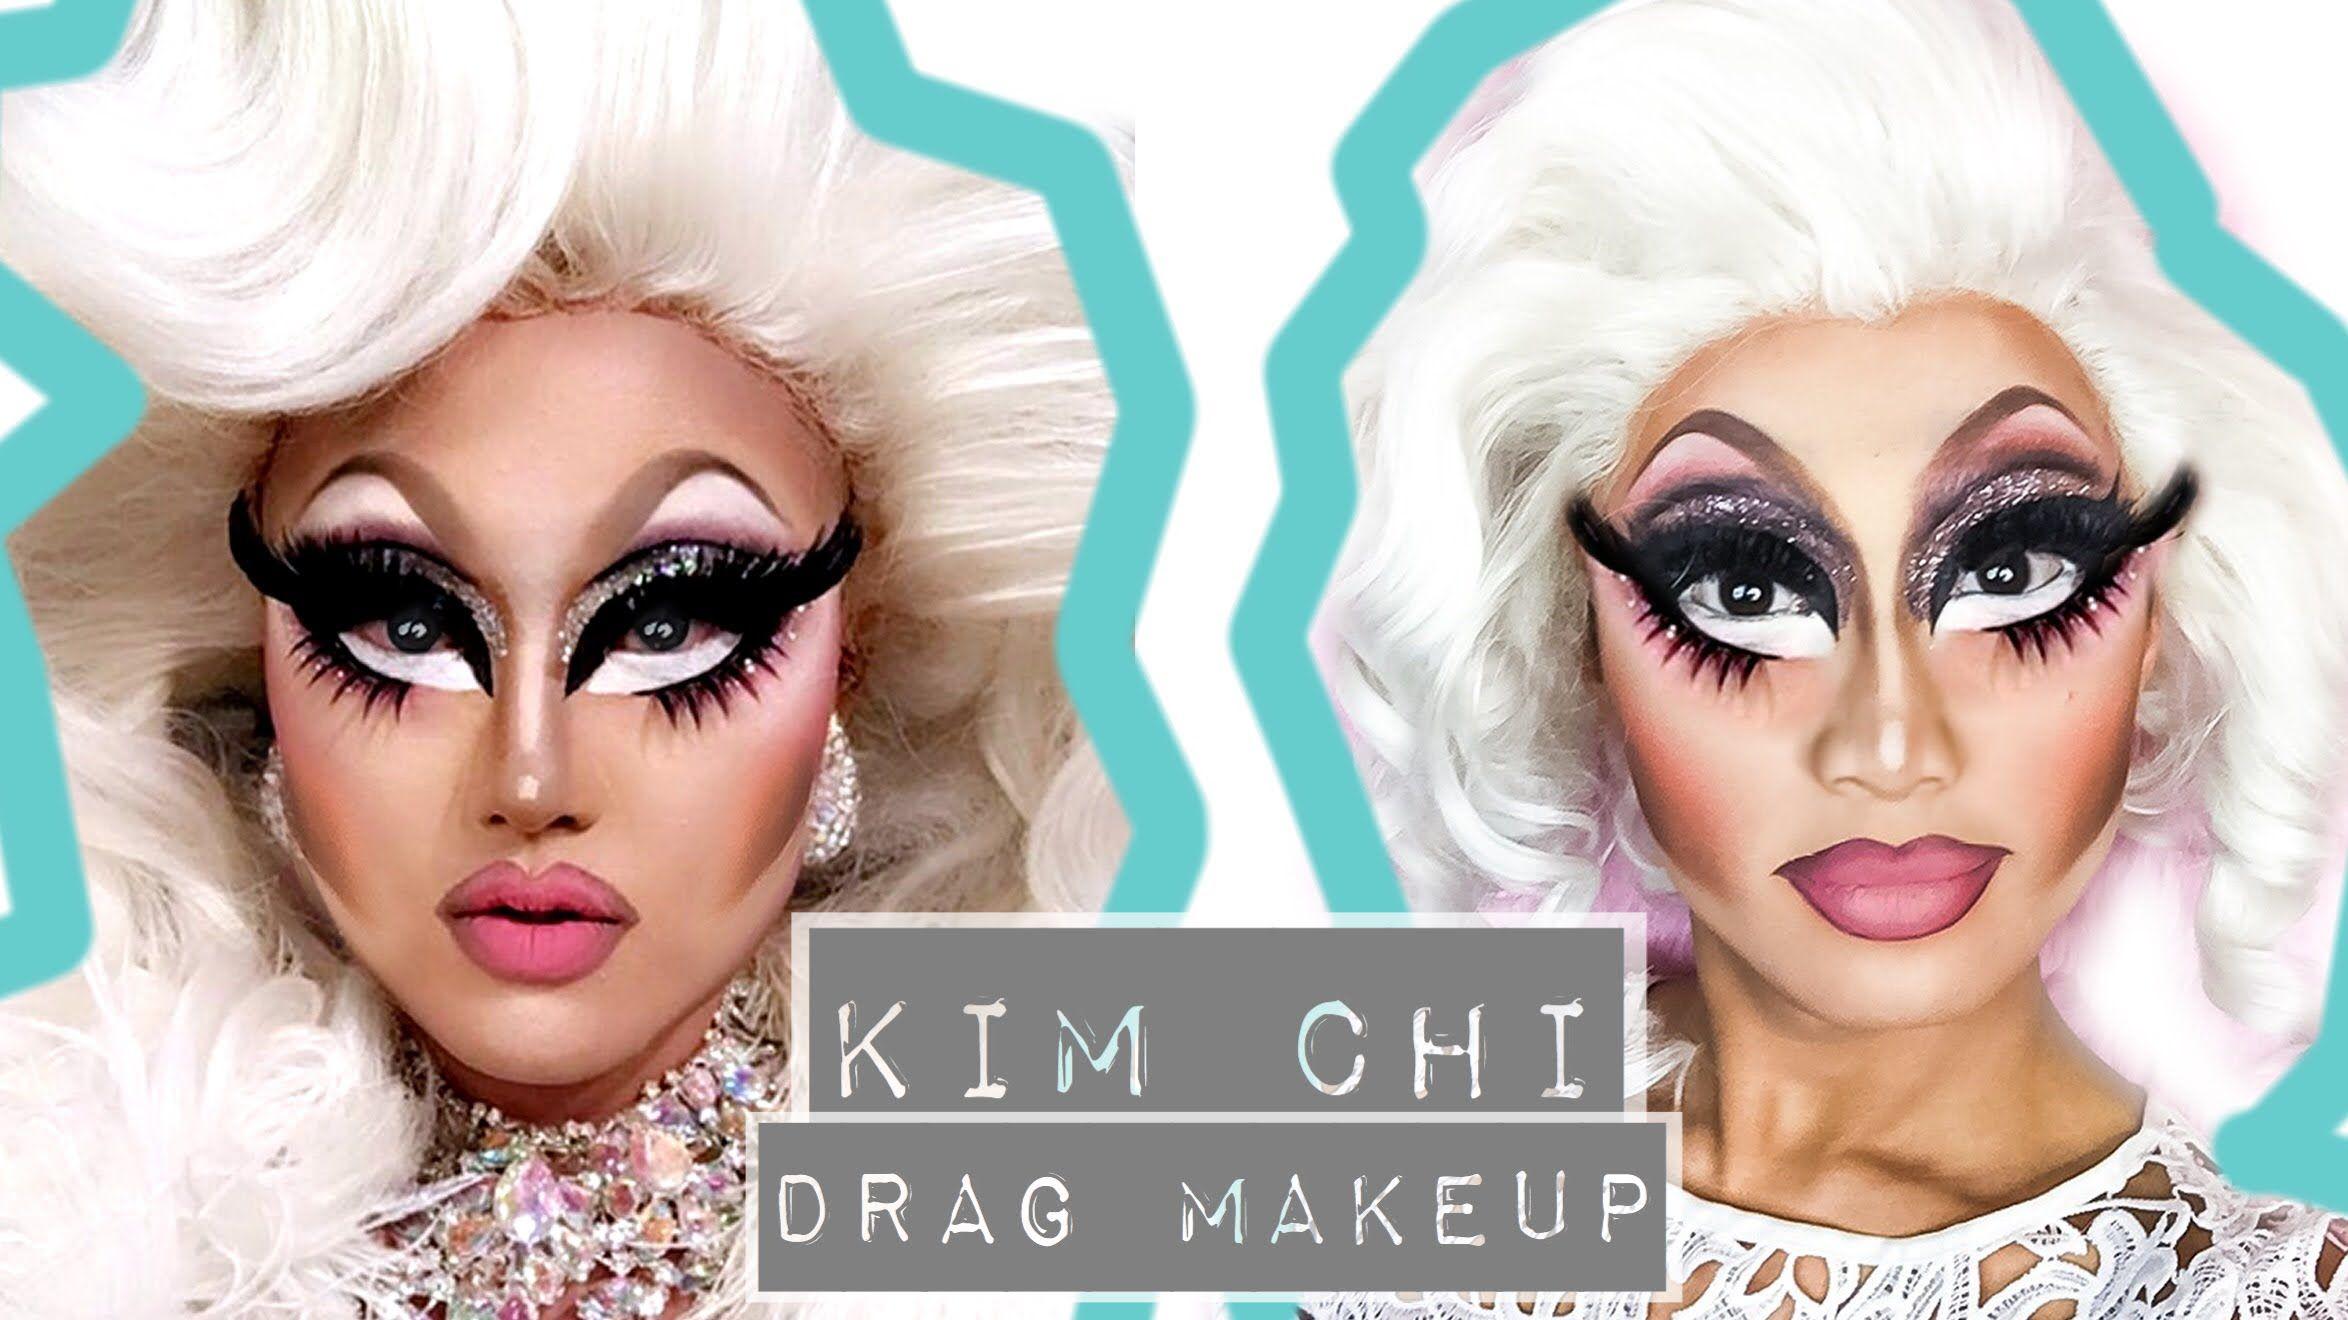 Kim chi drag makeup tutorial marc zapanta hmua childrens kim chi drag makeup tutorial marc zapanta baditri Images